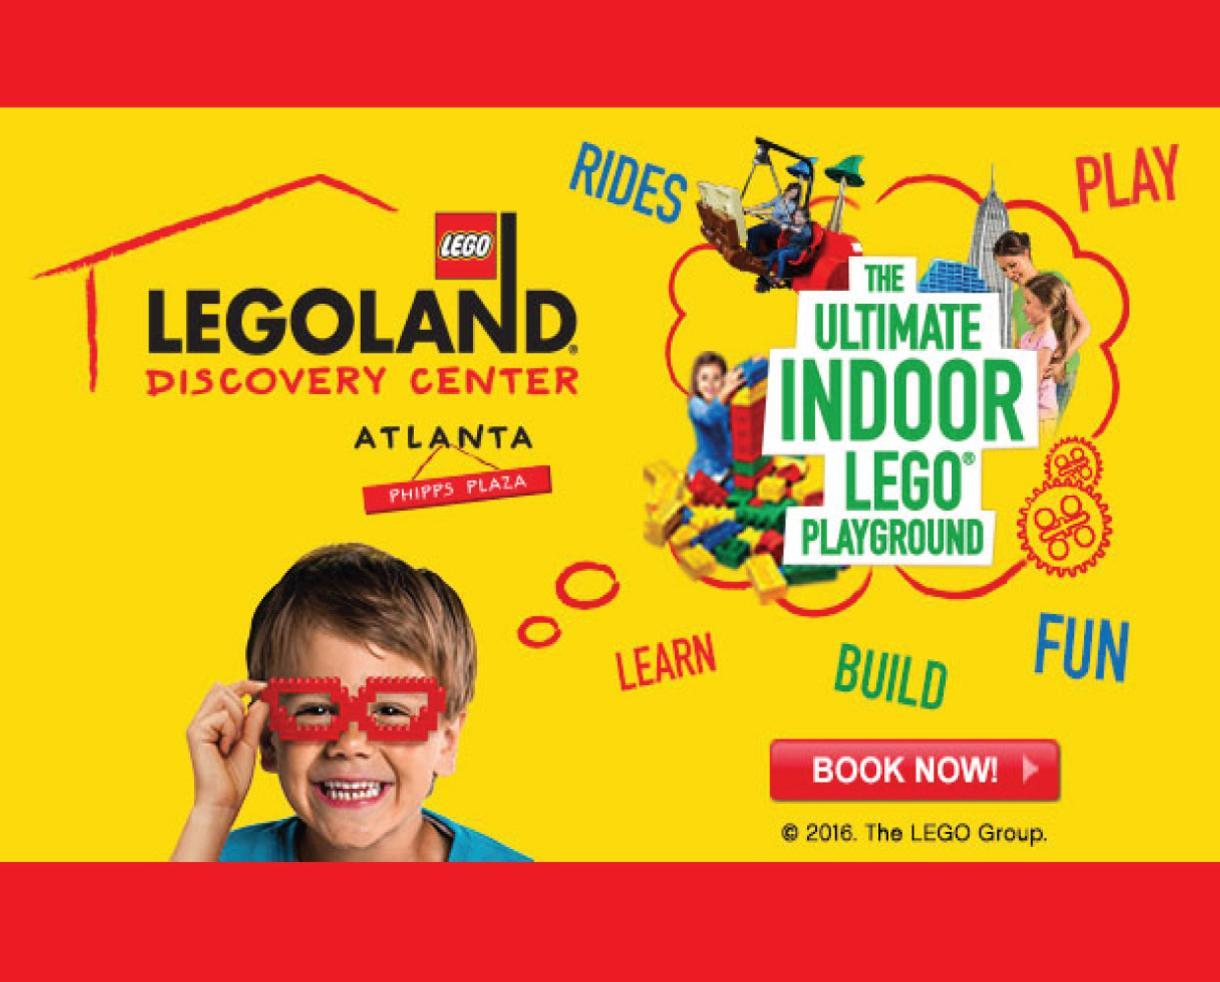 $12 for Legoland Discovery Center Atlanta Admission ($21.55 Value - 45% Off)